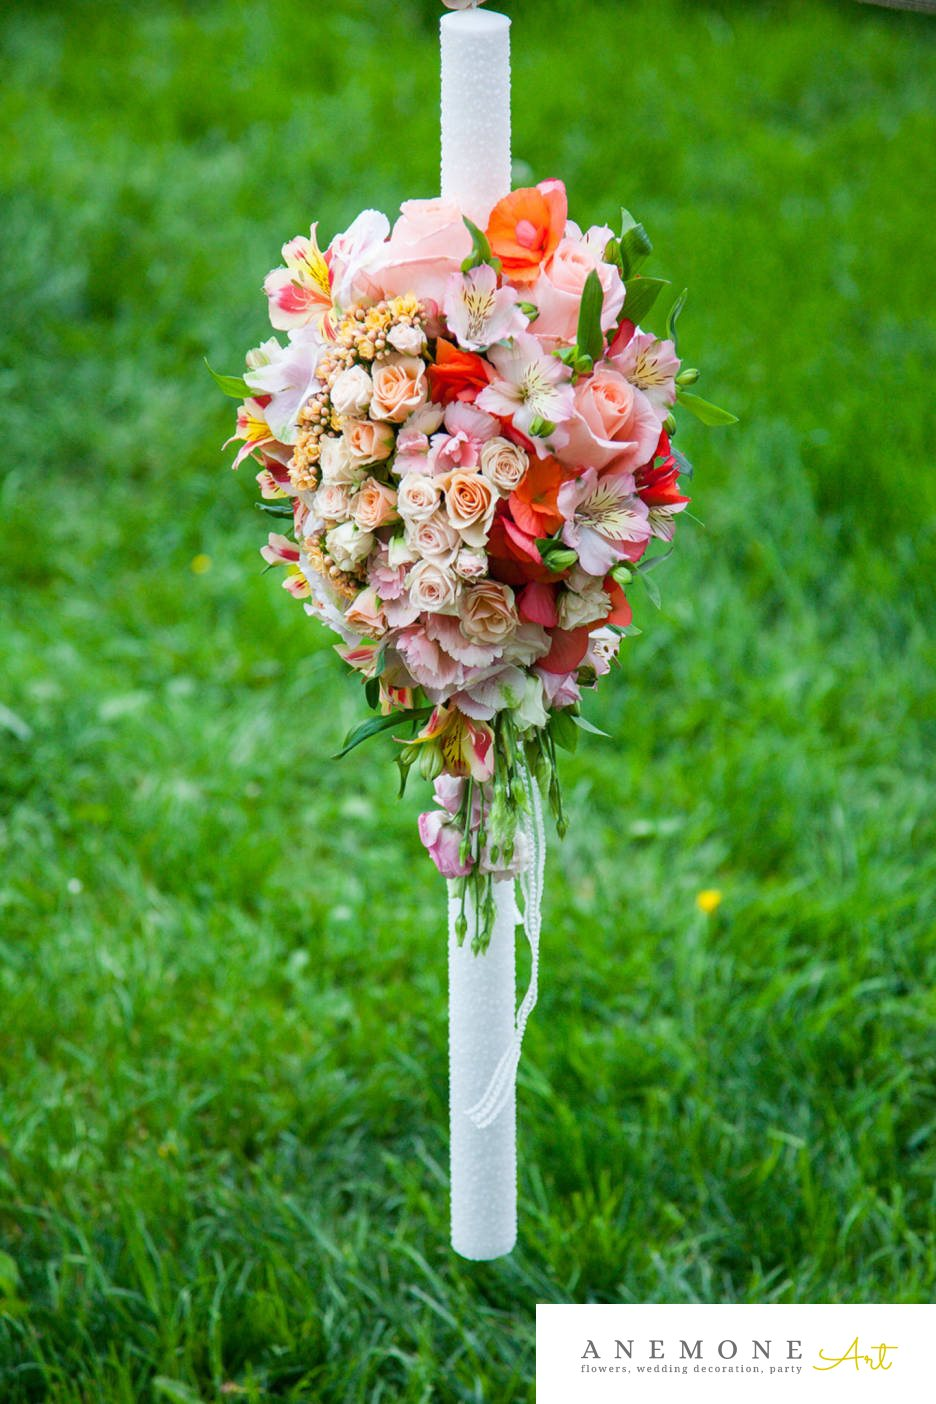 Poza, foto cu Flori de nunta alstroemeria, lumanare cununie, mini-rosa, multicolor, trandafiri in Arad, Timisoara, Oradea (wedding flowers, bouquets) nunta Arad, Timisoara, Oradea